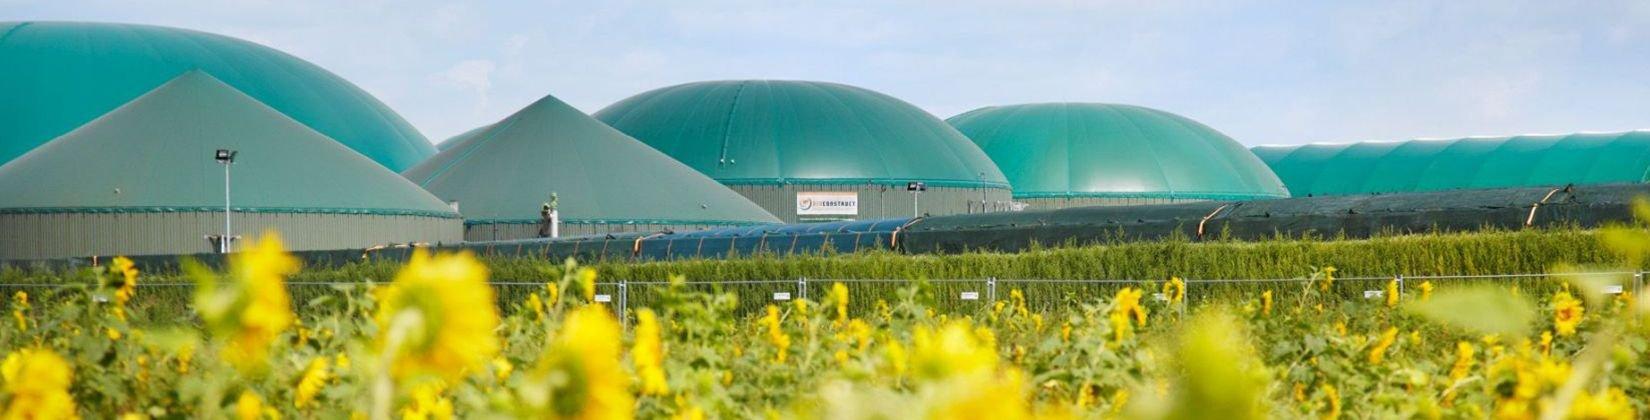 Biogasanlage, © Fachverband Biogas e.V.